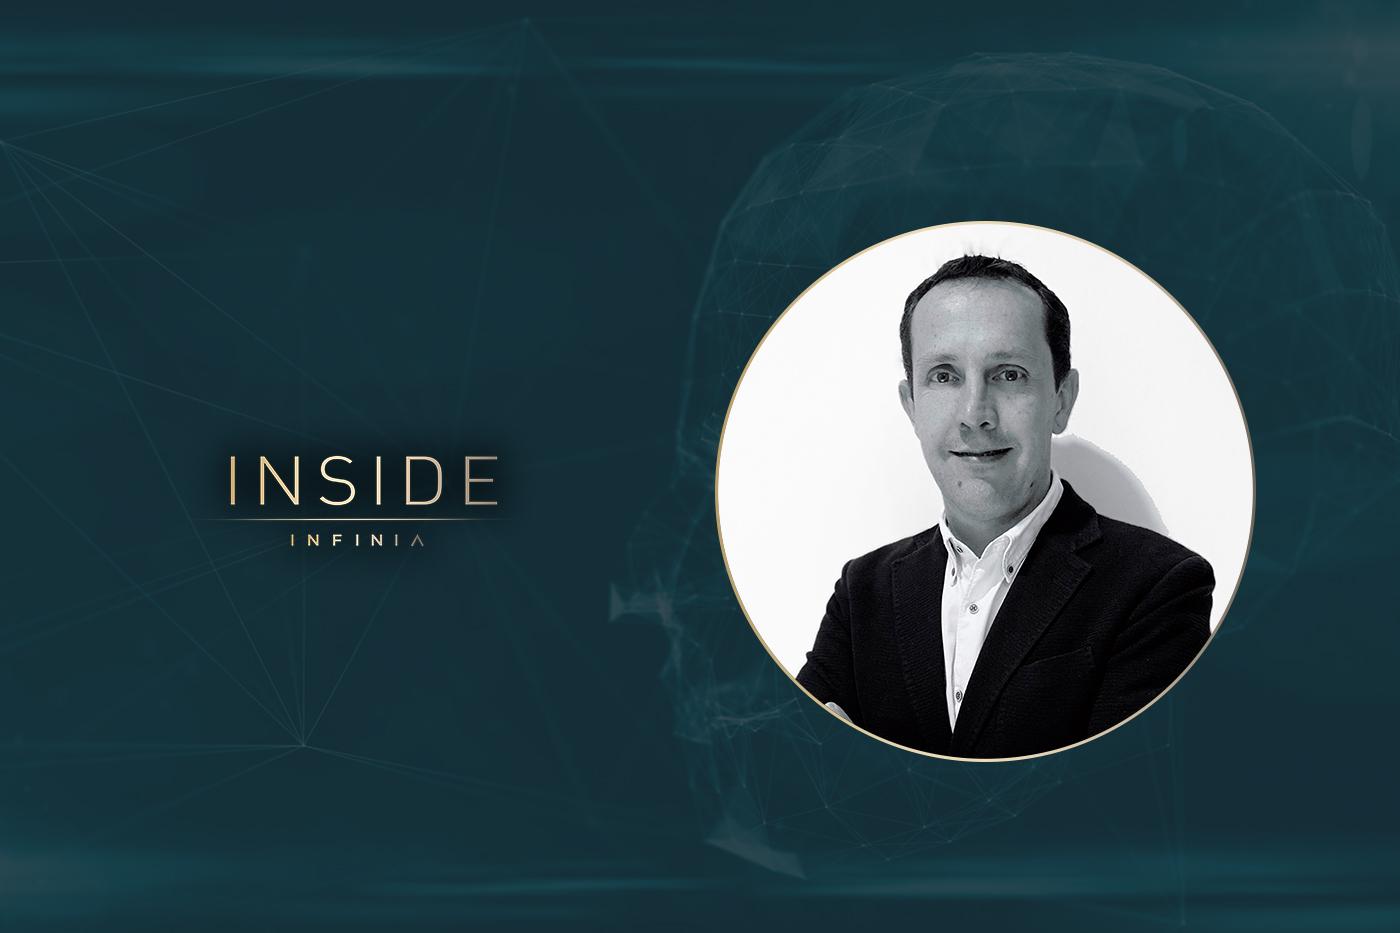 INSIDE INFINIA | Oscar Caraveo, Country Manager Mexico